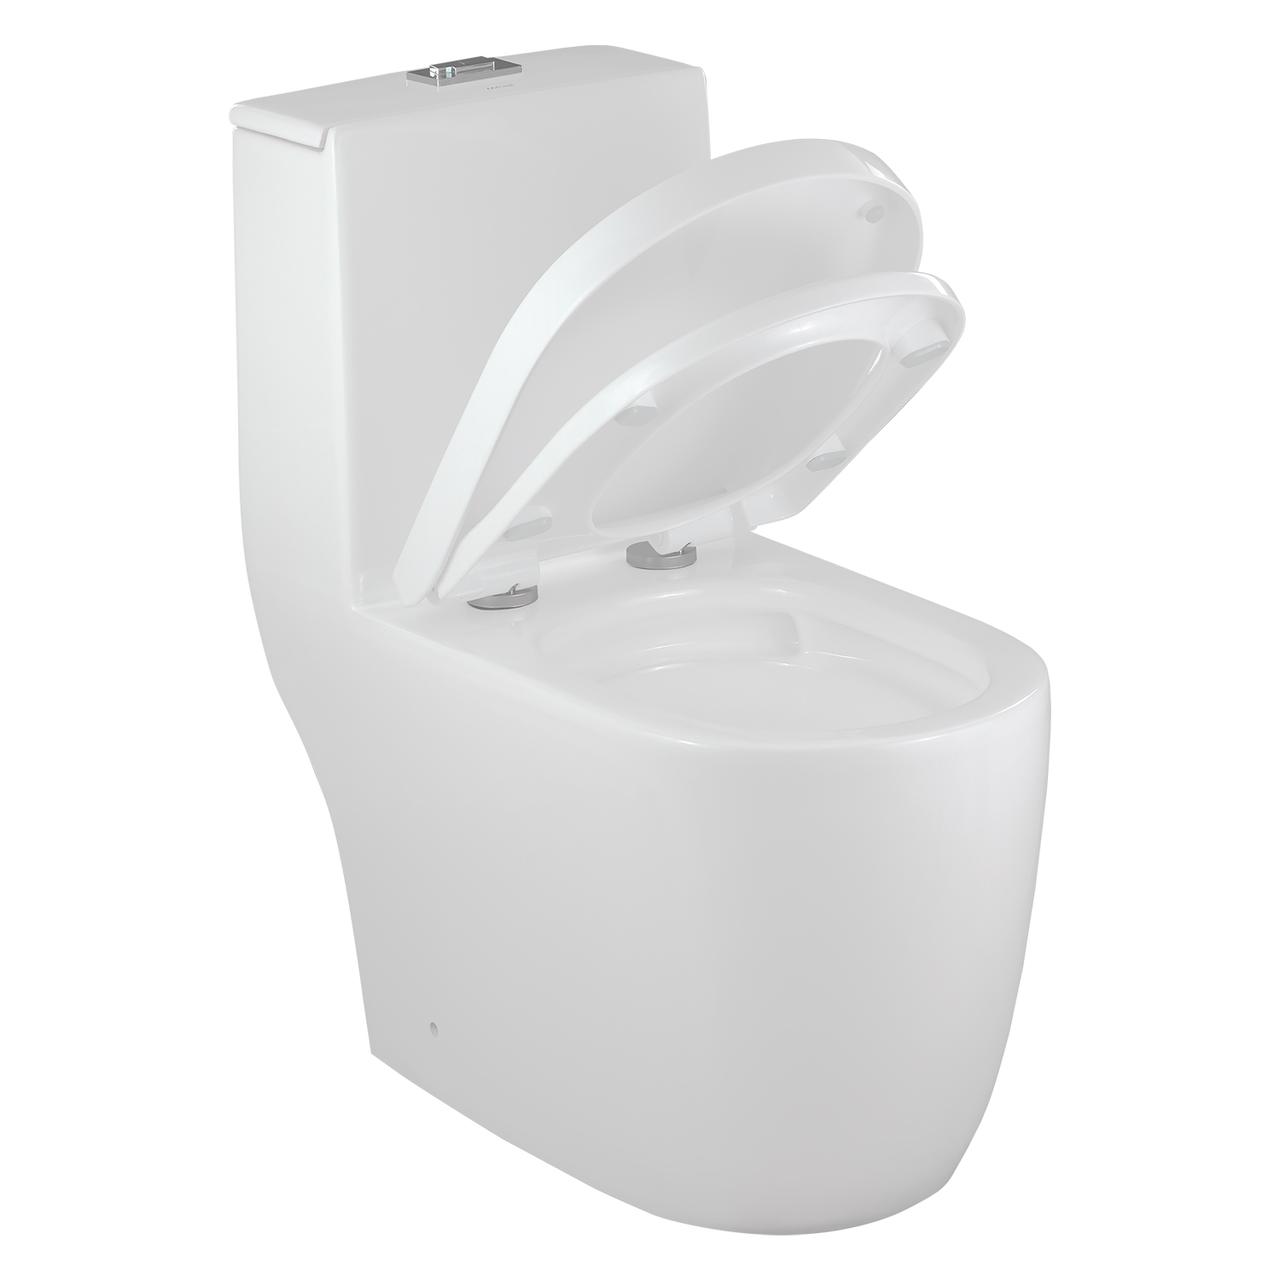 Vaso Sanitário Caixa Acoplada Redondo Branco Nias